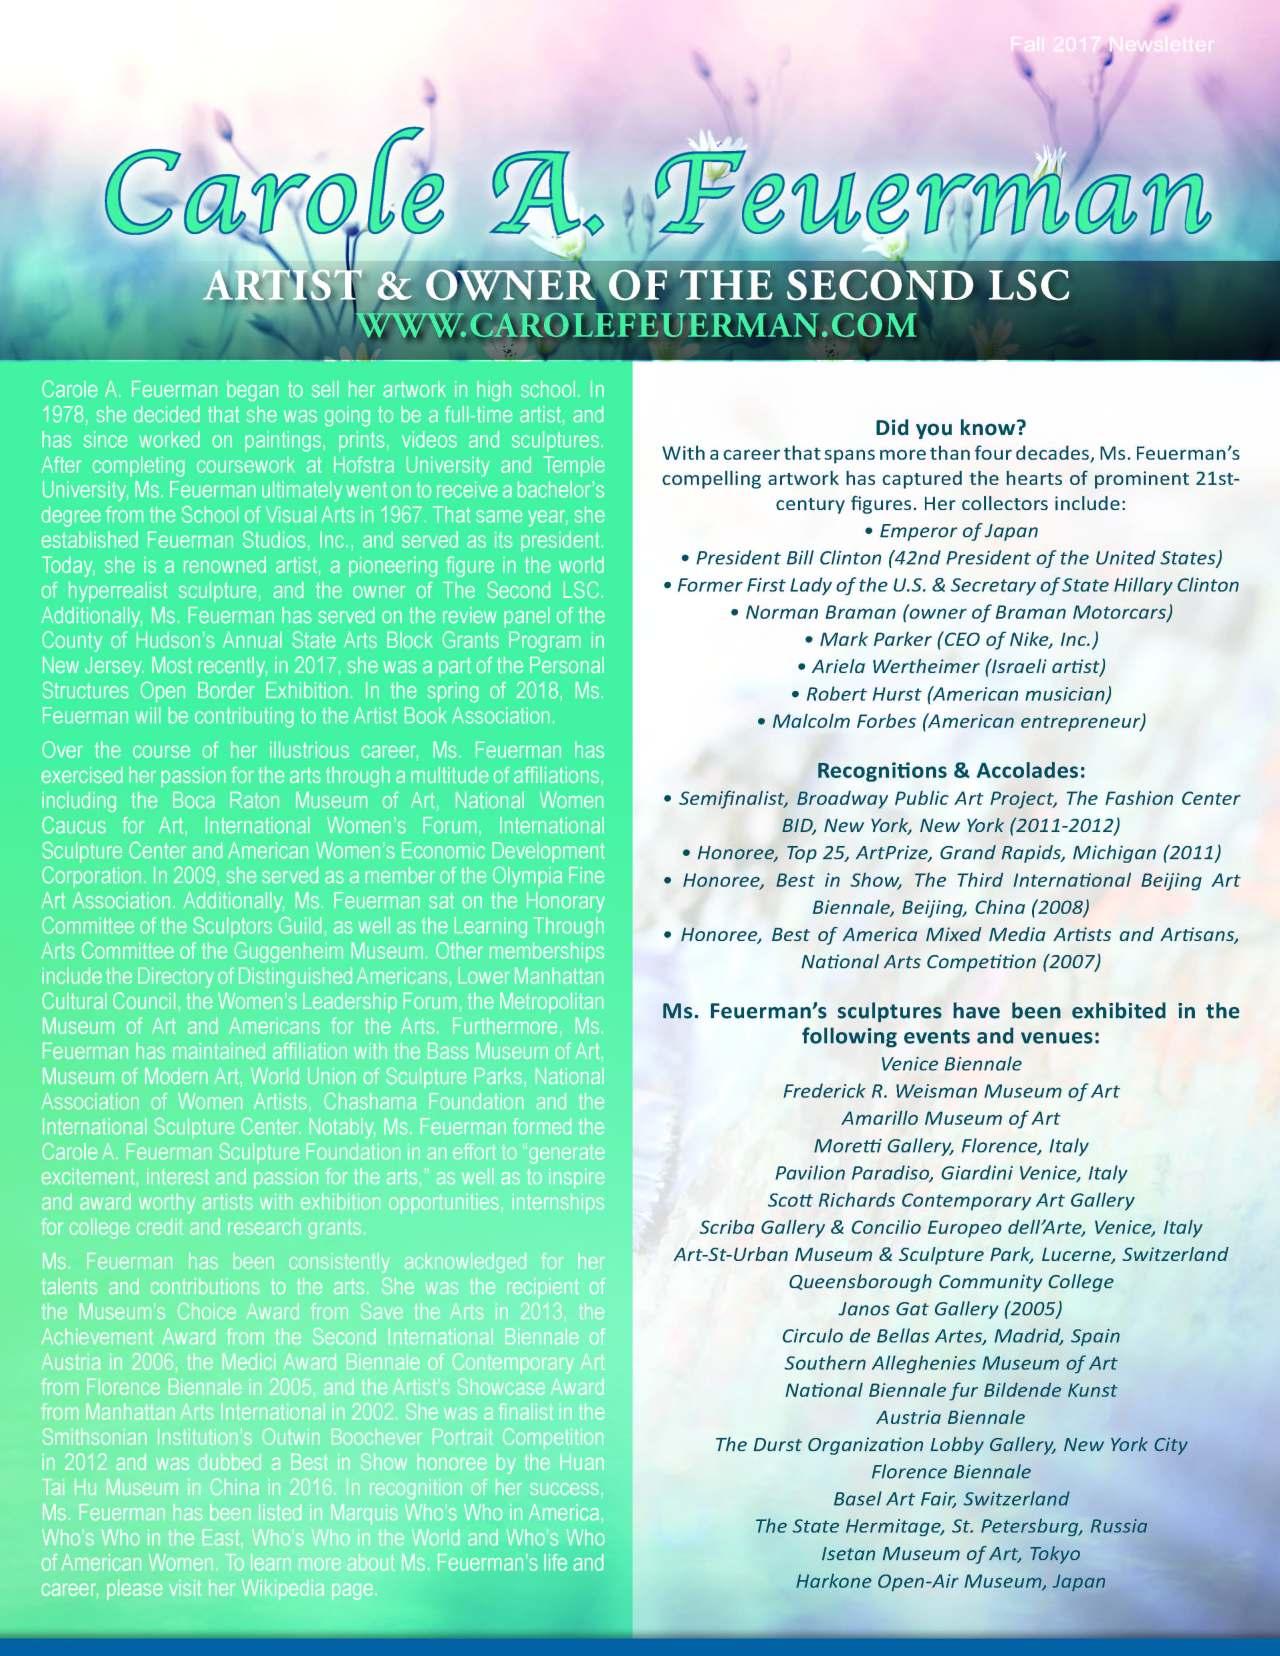 Feuerman, Carole 3689130_21799052 Newsletter.jpg